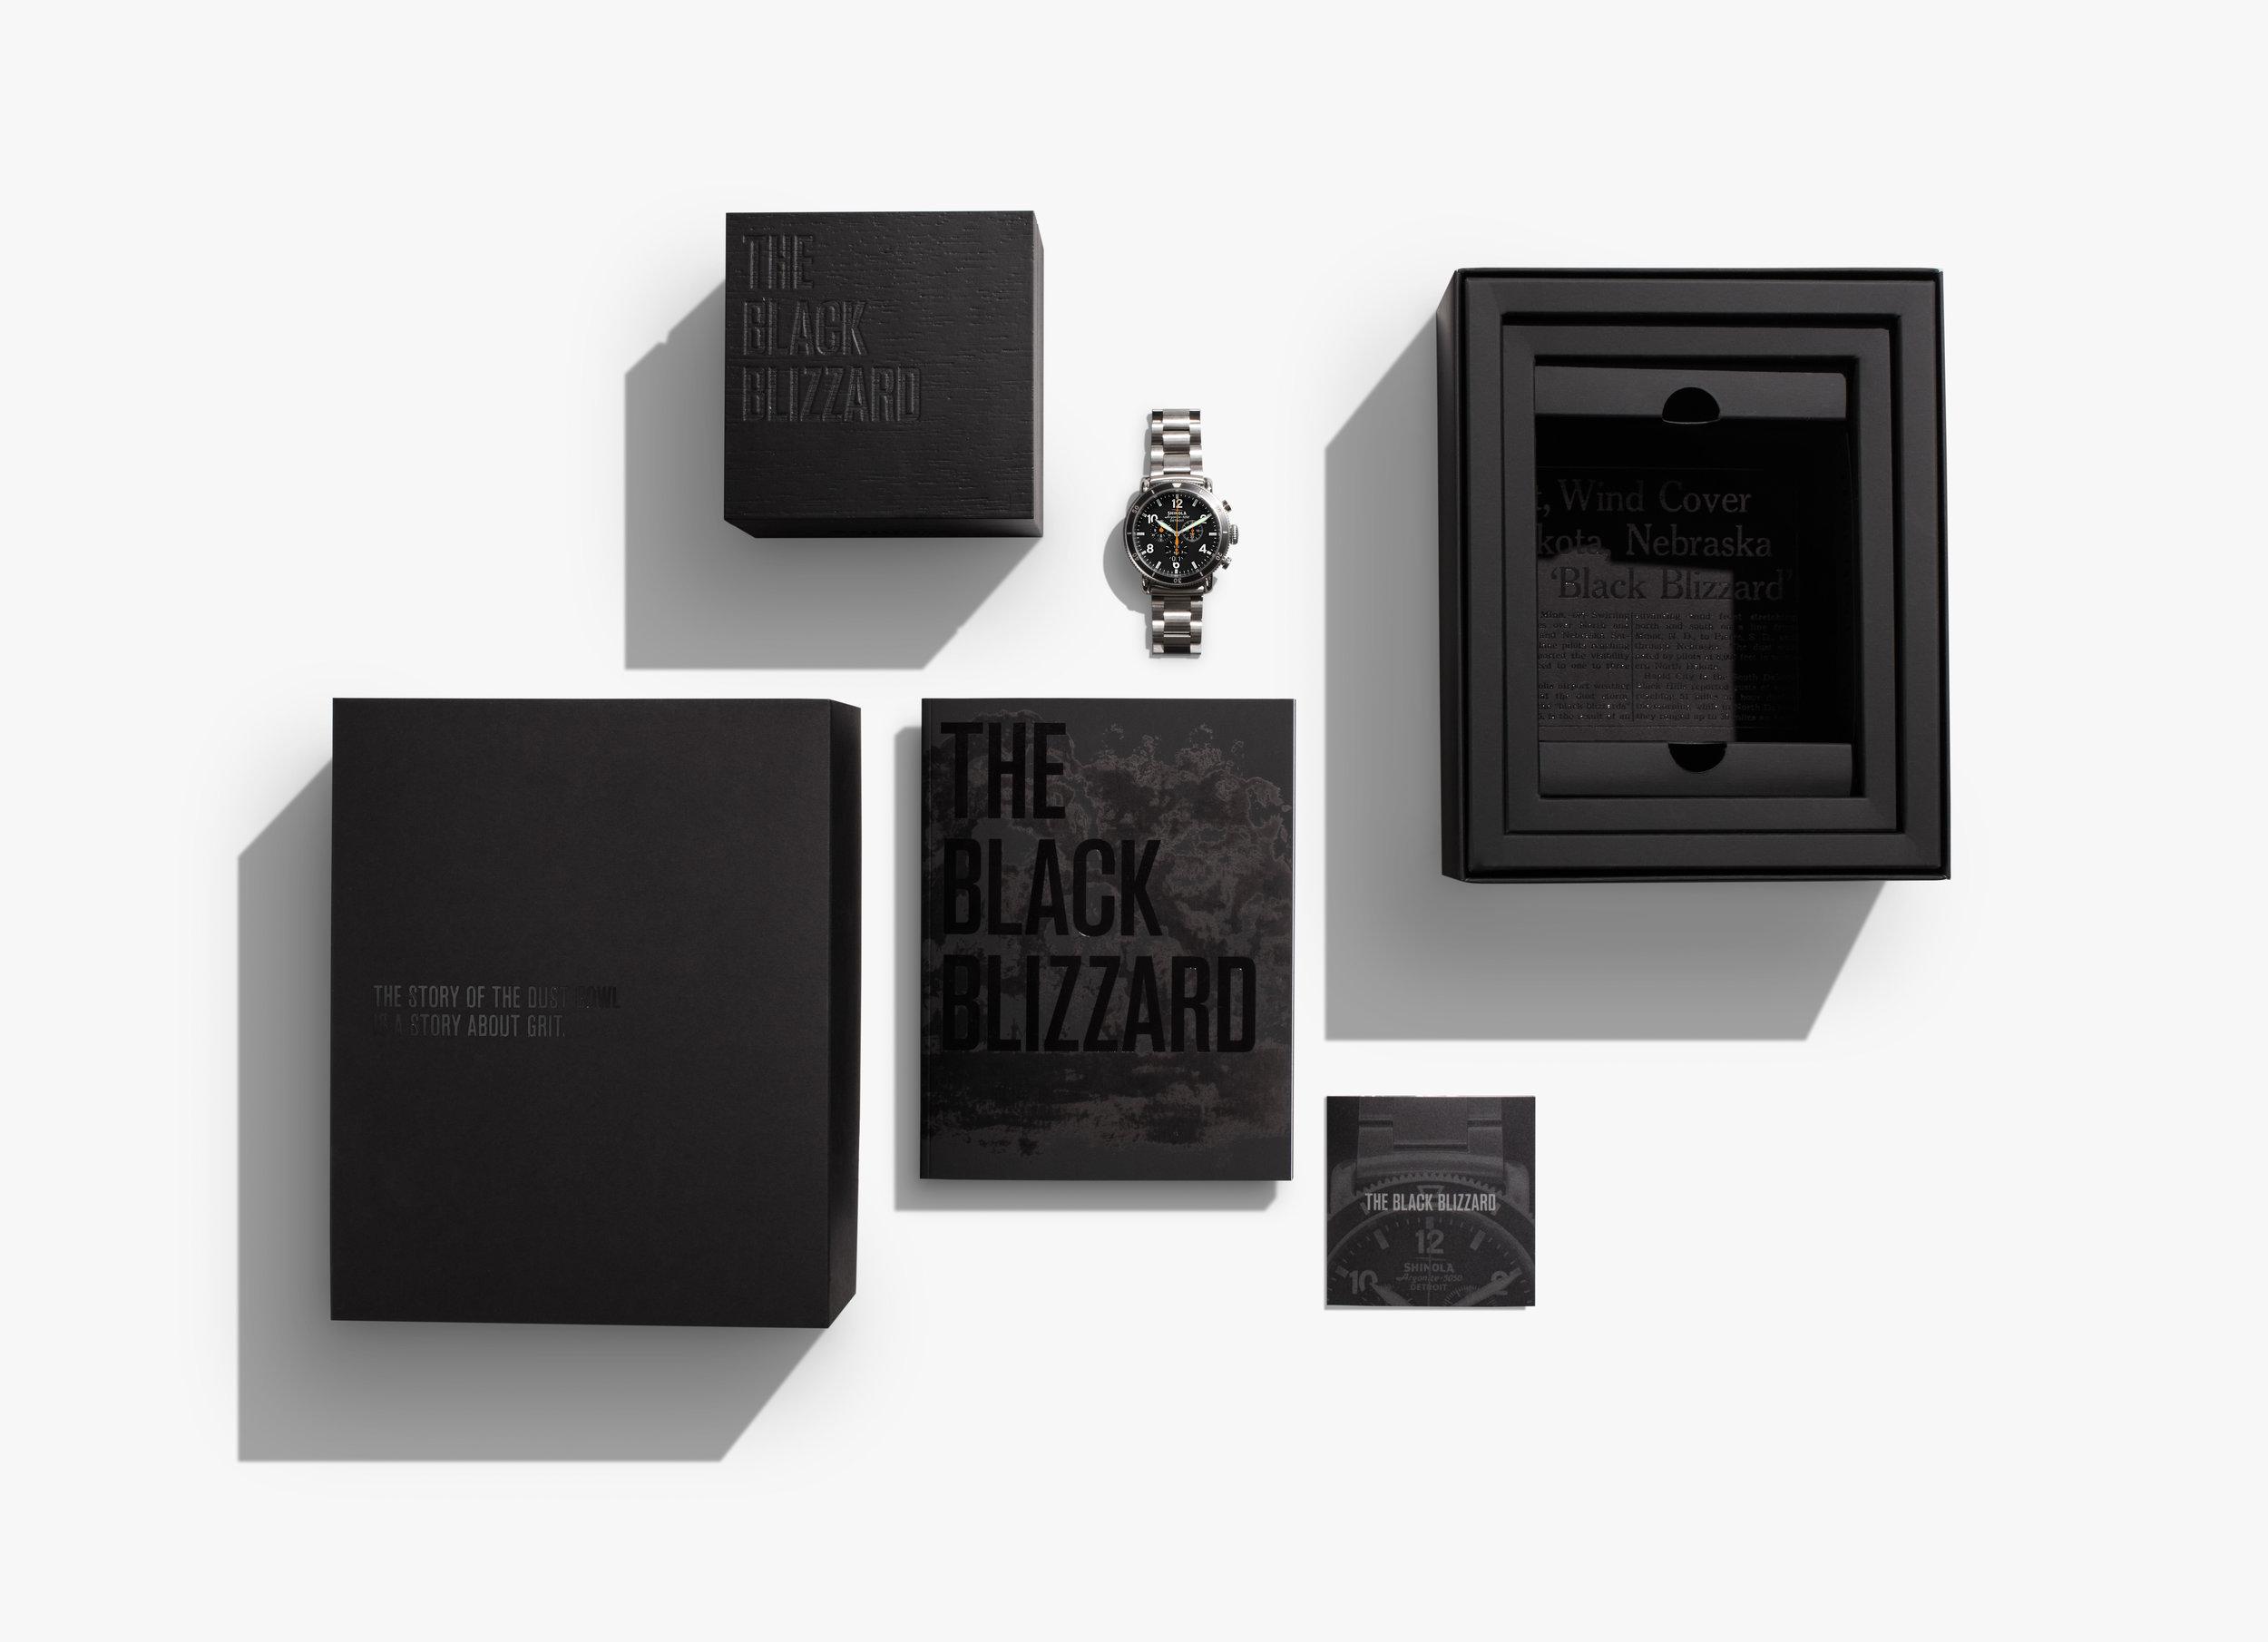 Black_Blizzard_Packaging_30473_Edit3.jpg